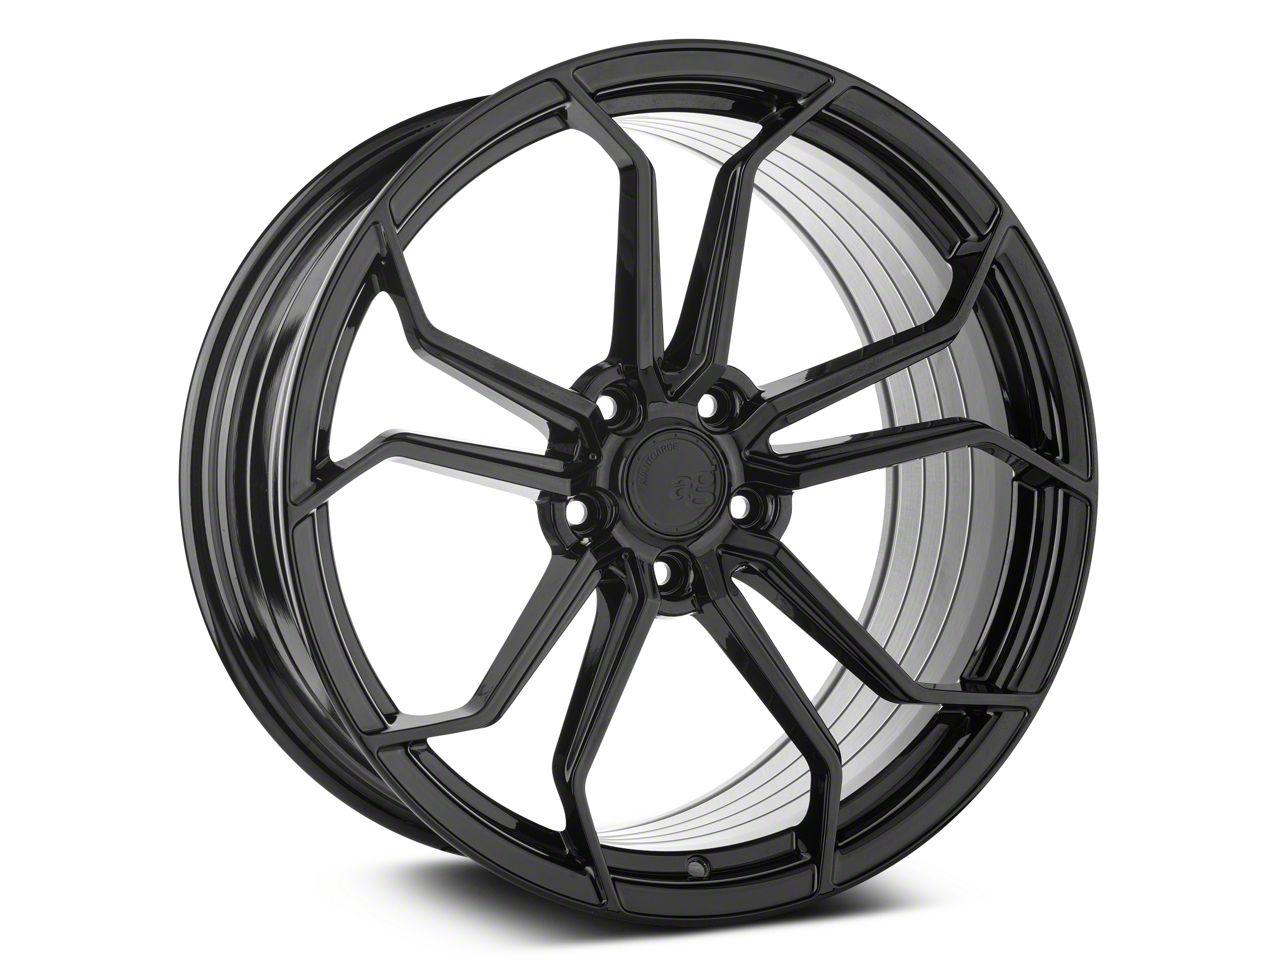 Avant Garde M632 Gloss Black Wheel - 20x11 - Rear Only (05-14 All)